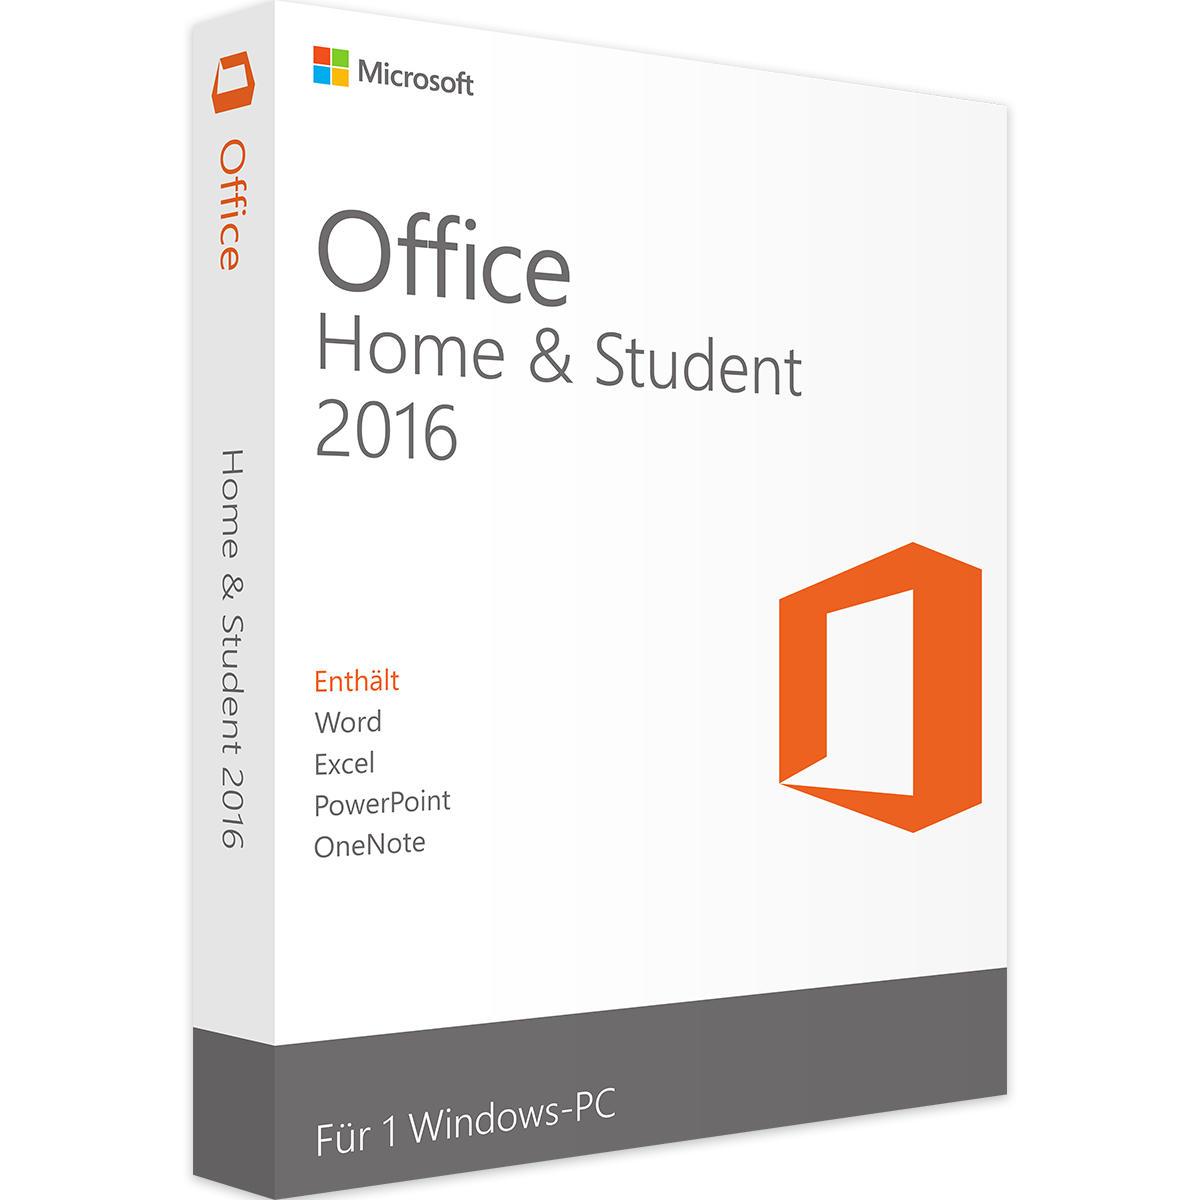 Microsoft Office 2016 Home & Student Windows